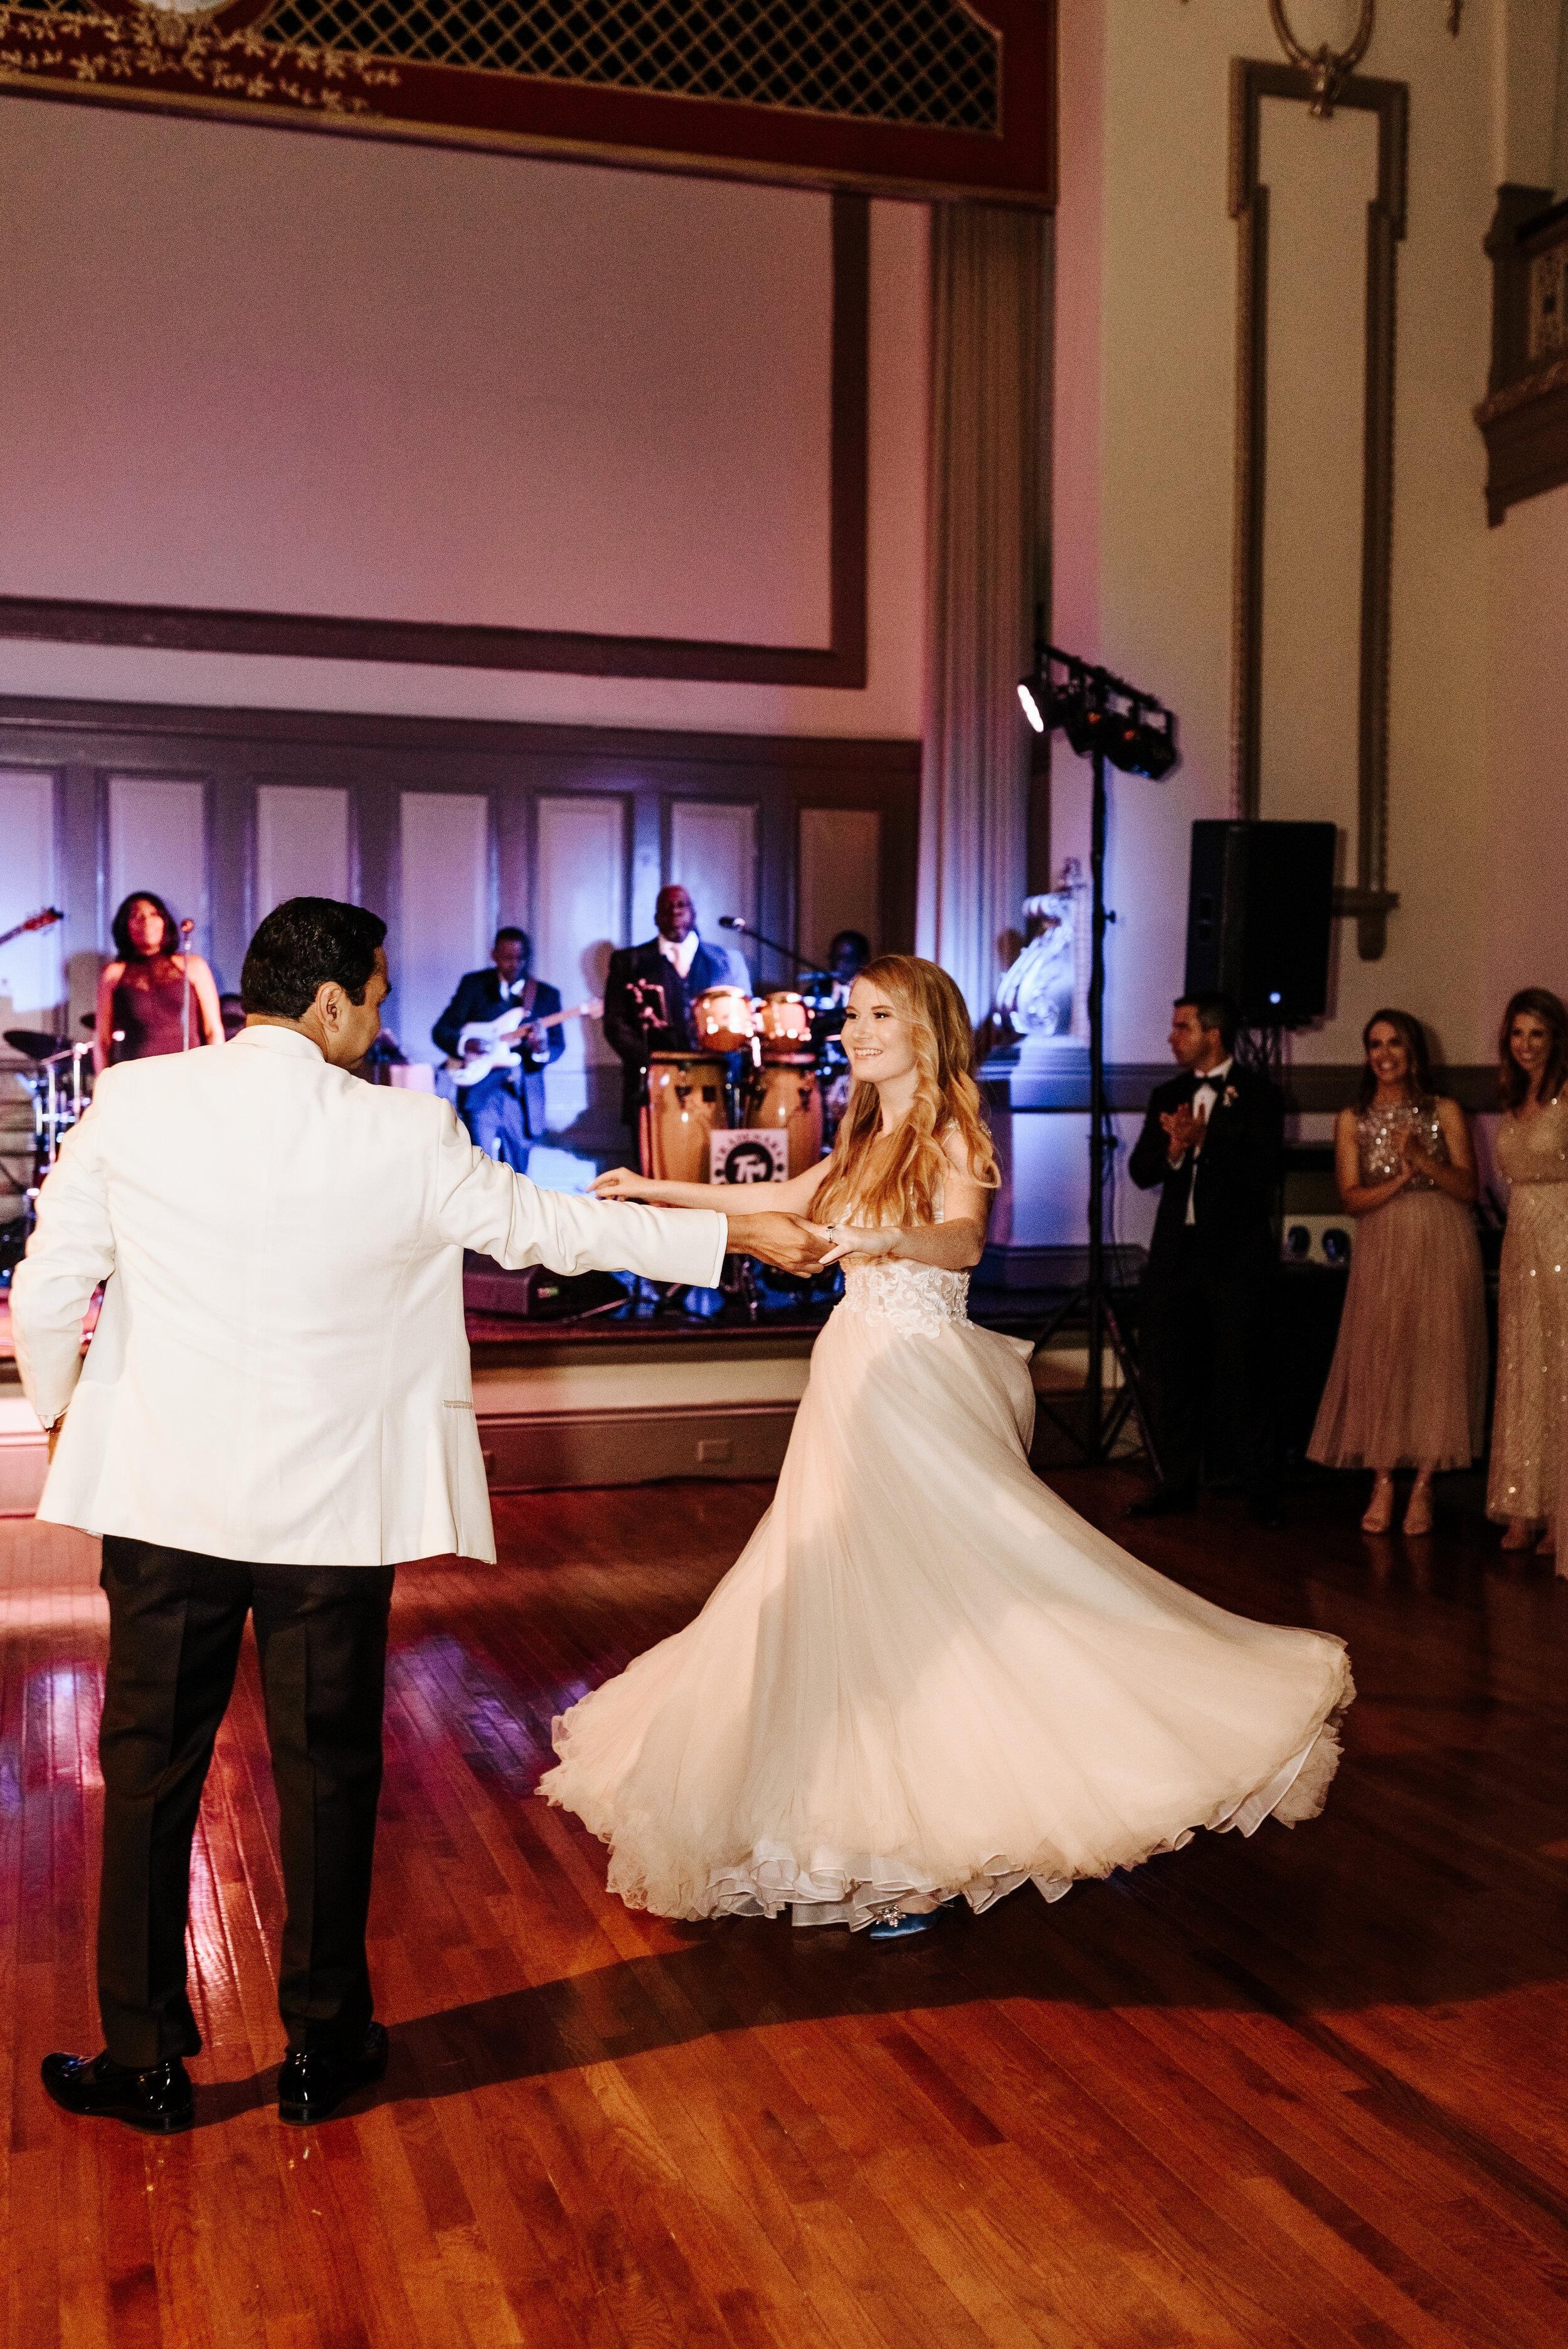 Cassie-Mrunal-Wedding-Quirk-Hotel-John-Marshall-Ballrooms-Richmond-Virginia-Photography-by-V-91.jpg